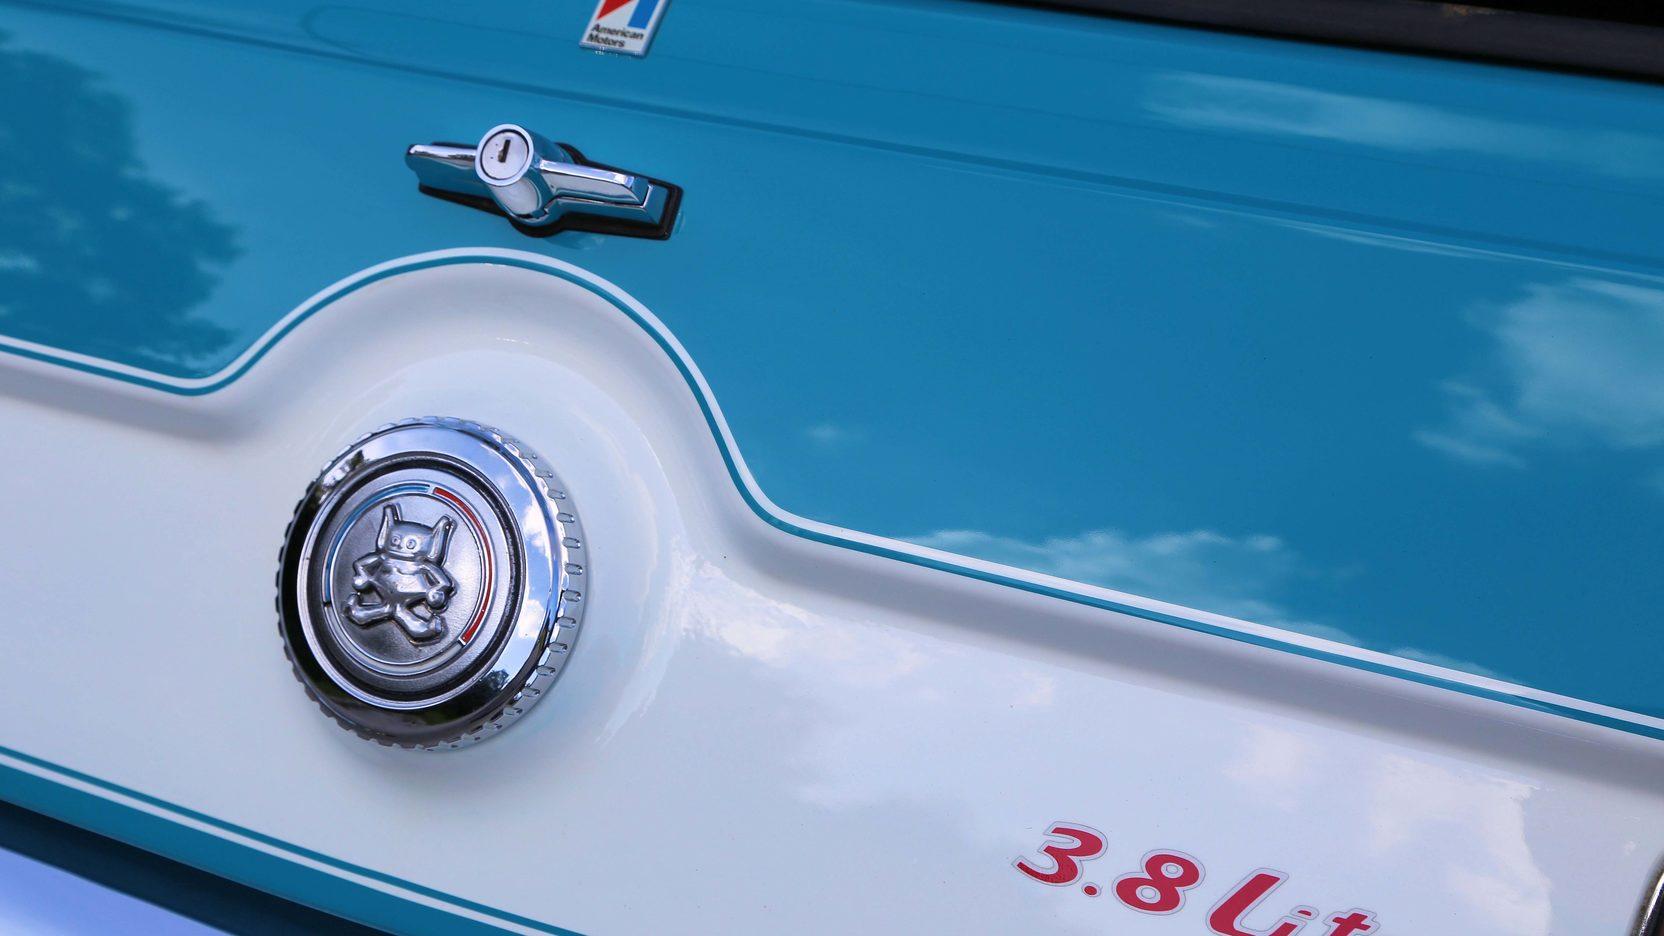 1972 AMC Gremlin X rear badge